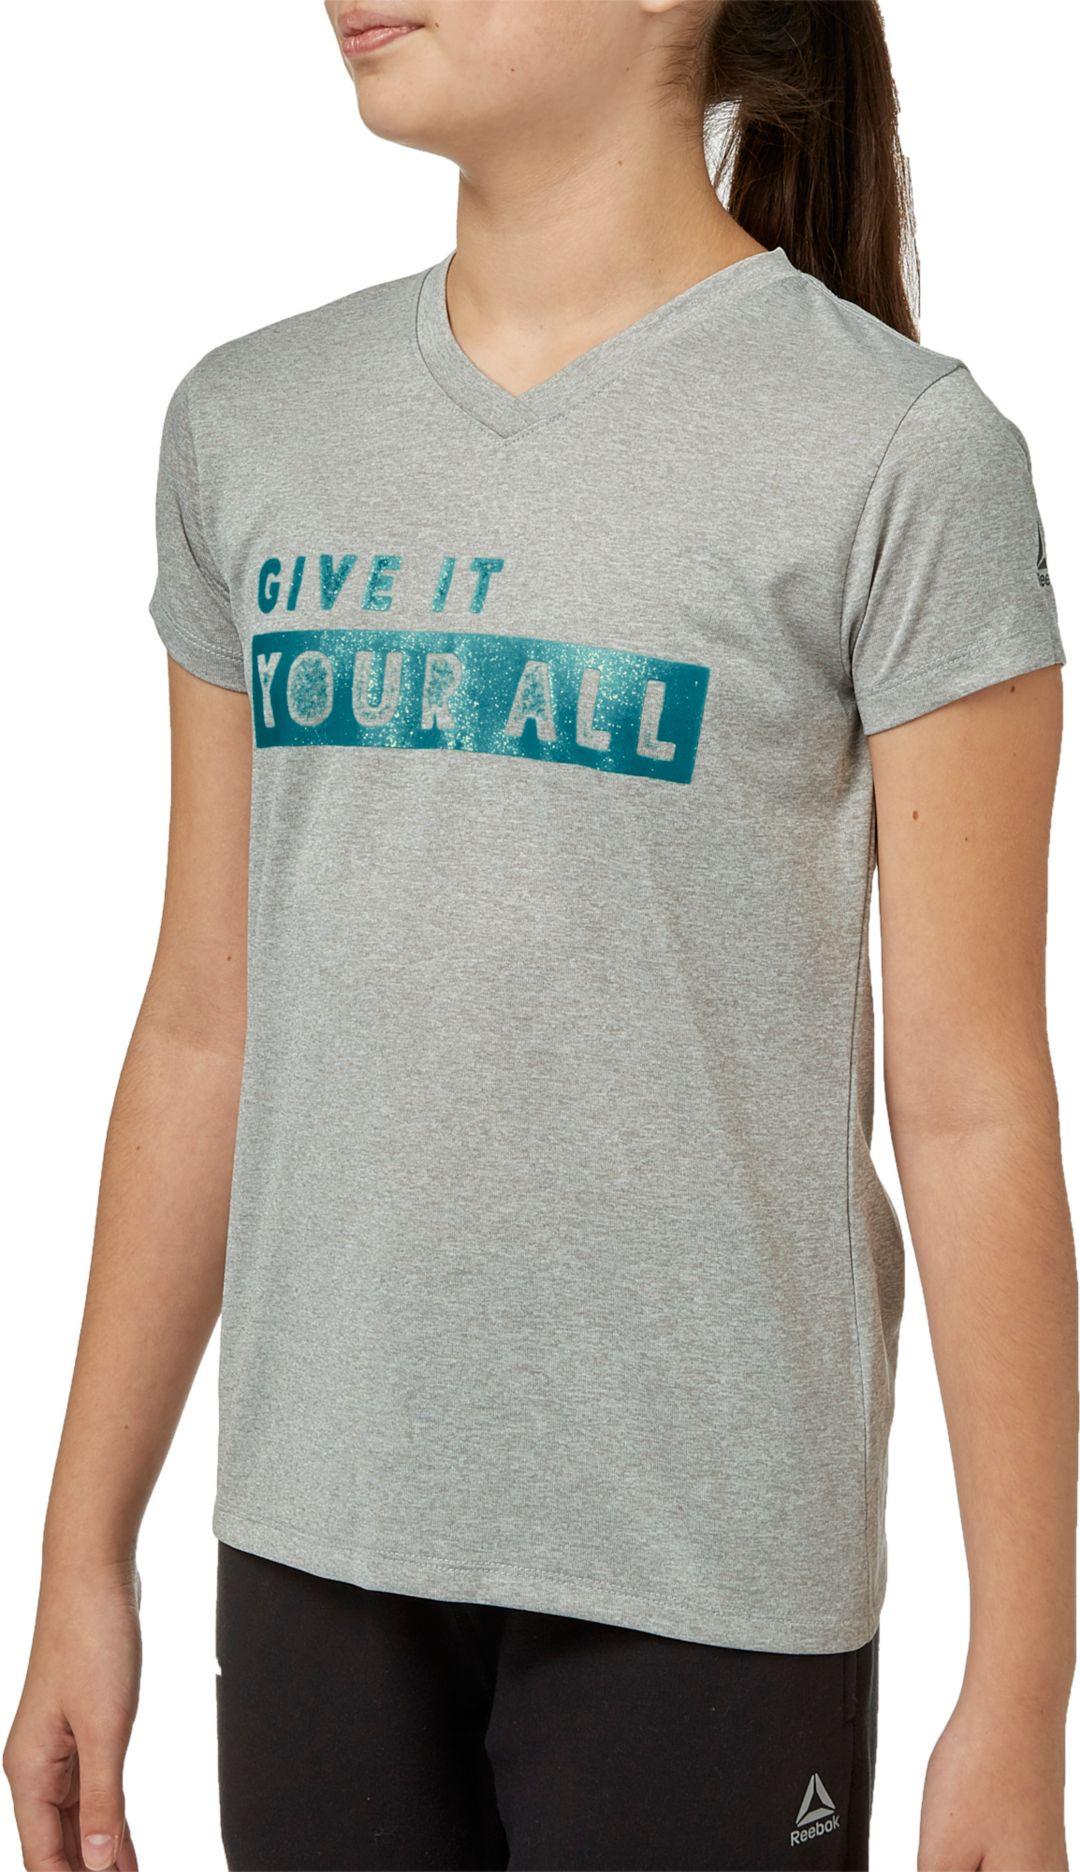 half off c4a5a 8b052 Reebok Girls  Heather Graphic V-Neck T-Shirt. noImageFound. Previous